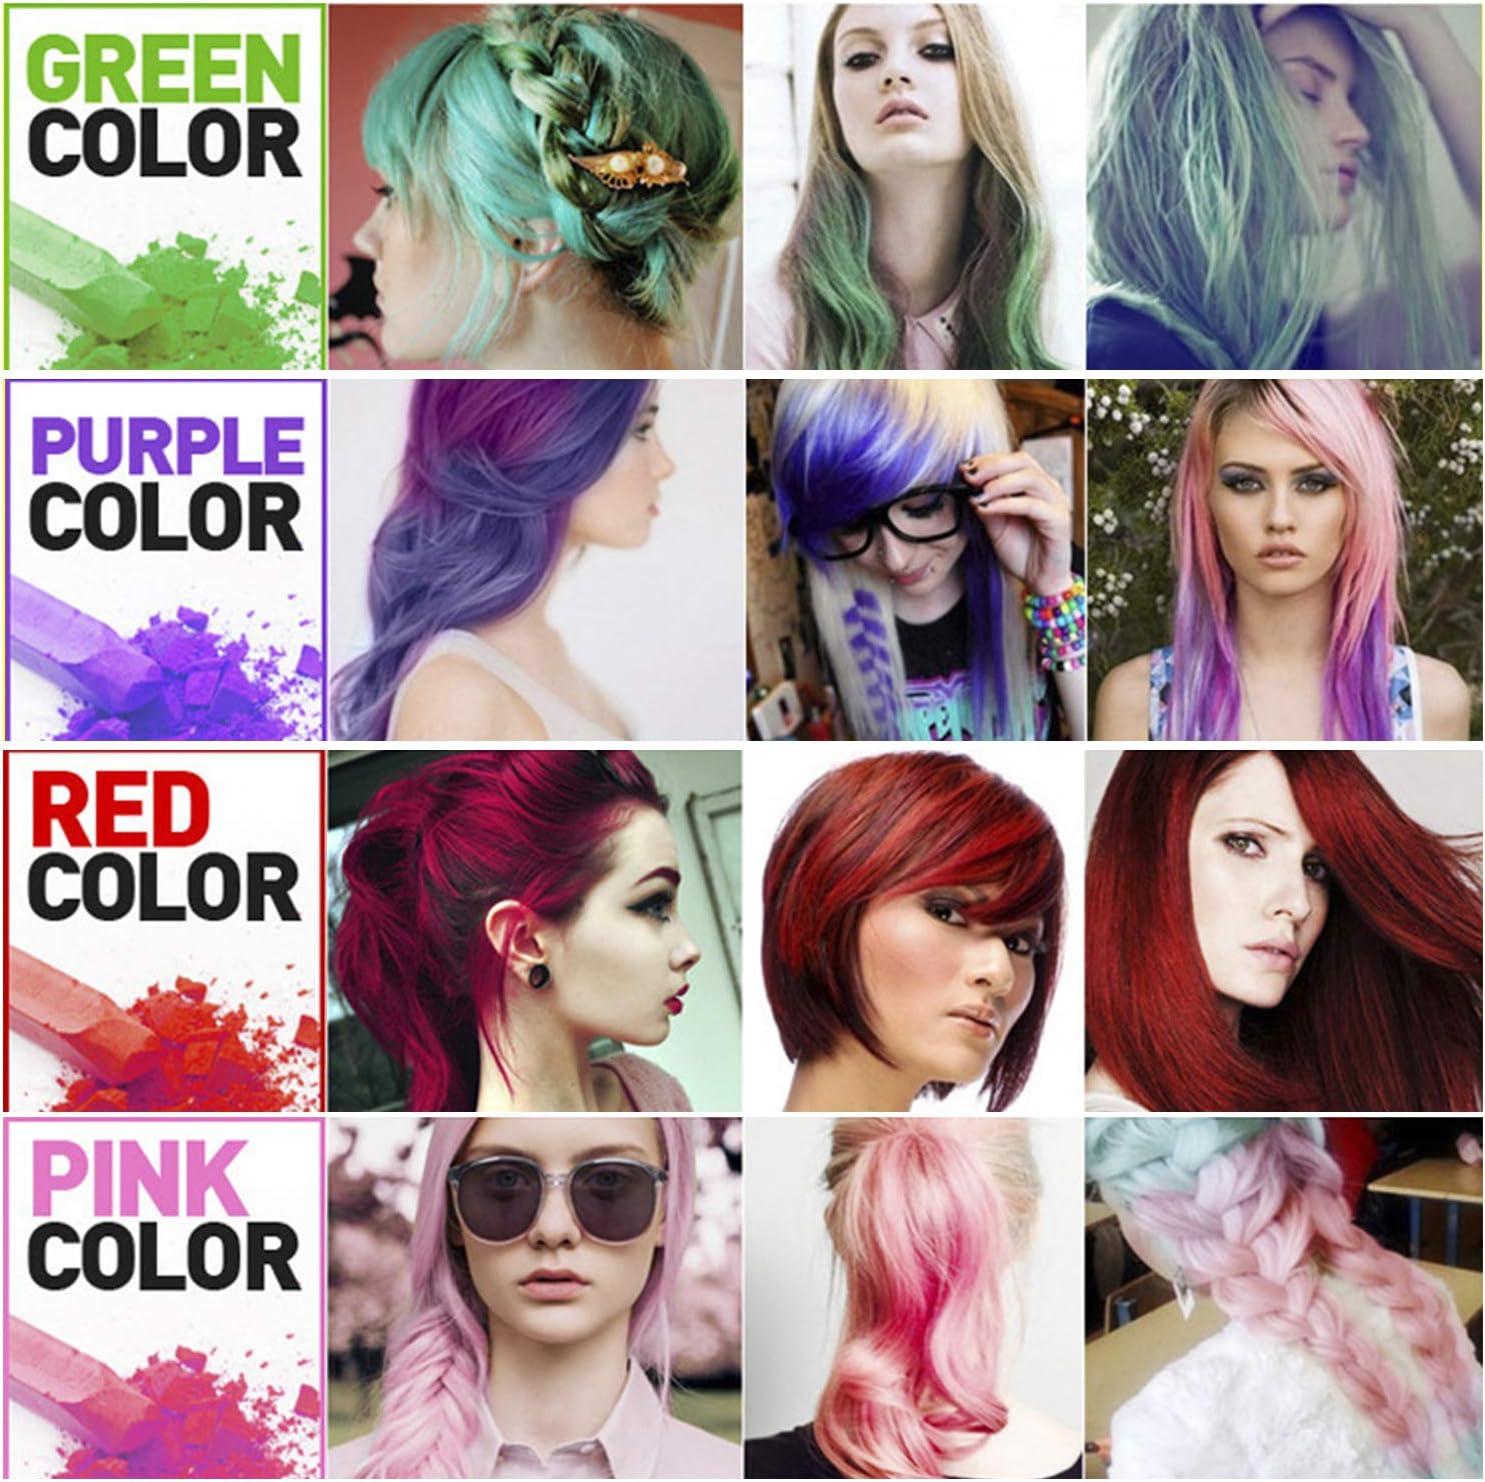 J TOHLO Tiza para el Cabello 12 Colores Lavables Tinte para Cabello Tinte Temporal de Tiza Para el Pelo para el Cabello Regalos para niñas Para ...